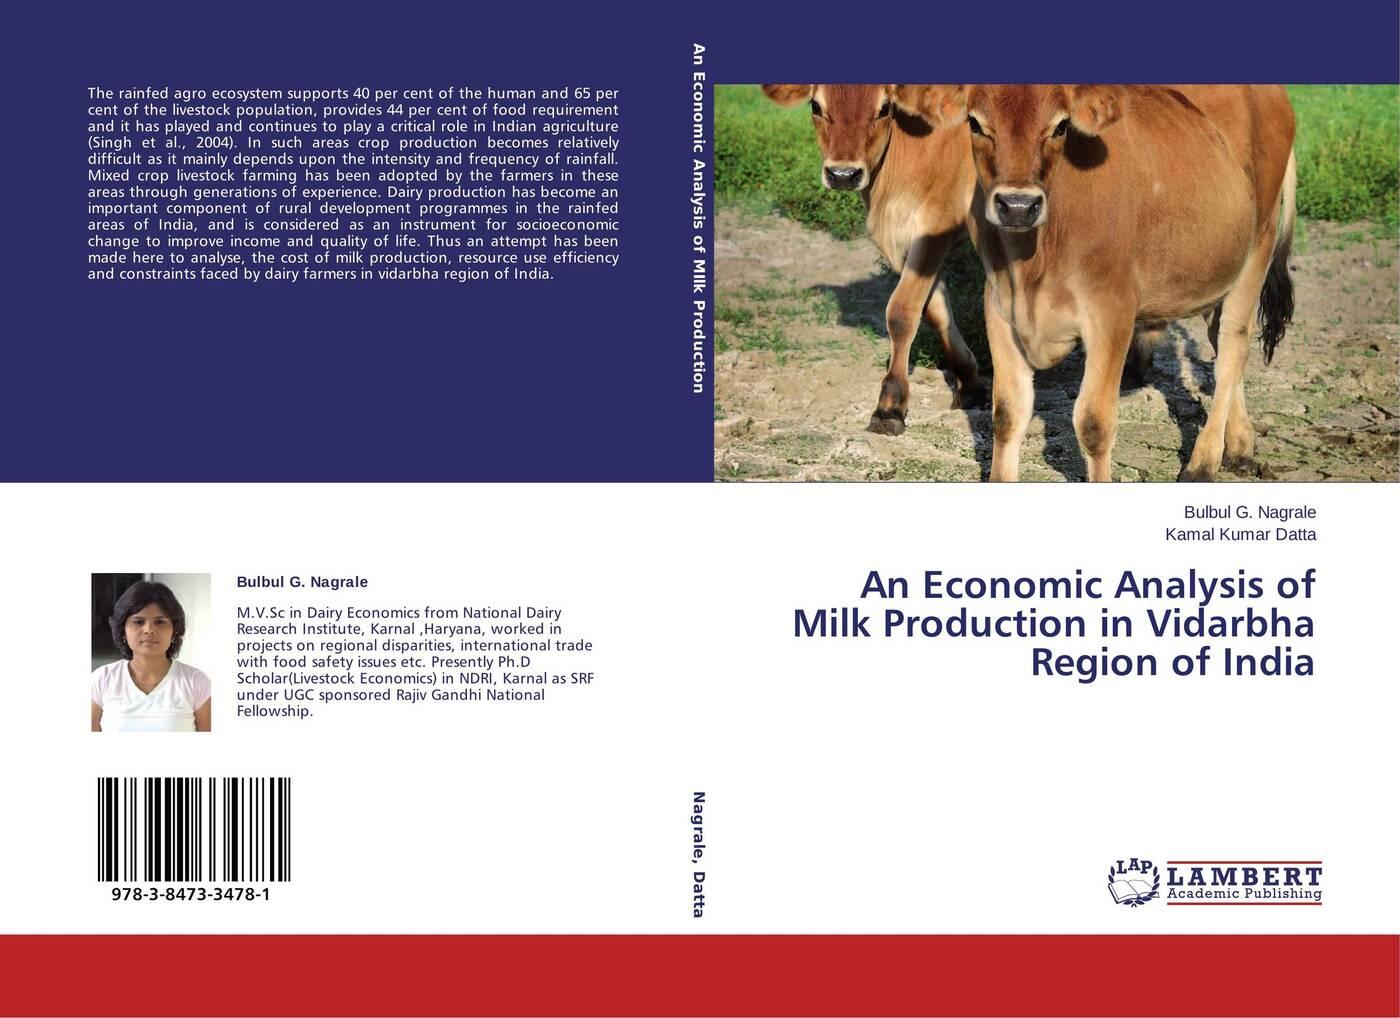 Bulbul G. Nagrale and Kamal Kumar Datta An Economic Analysis of Milk Production in Vidarbha Region of India цена в Москве и Питере